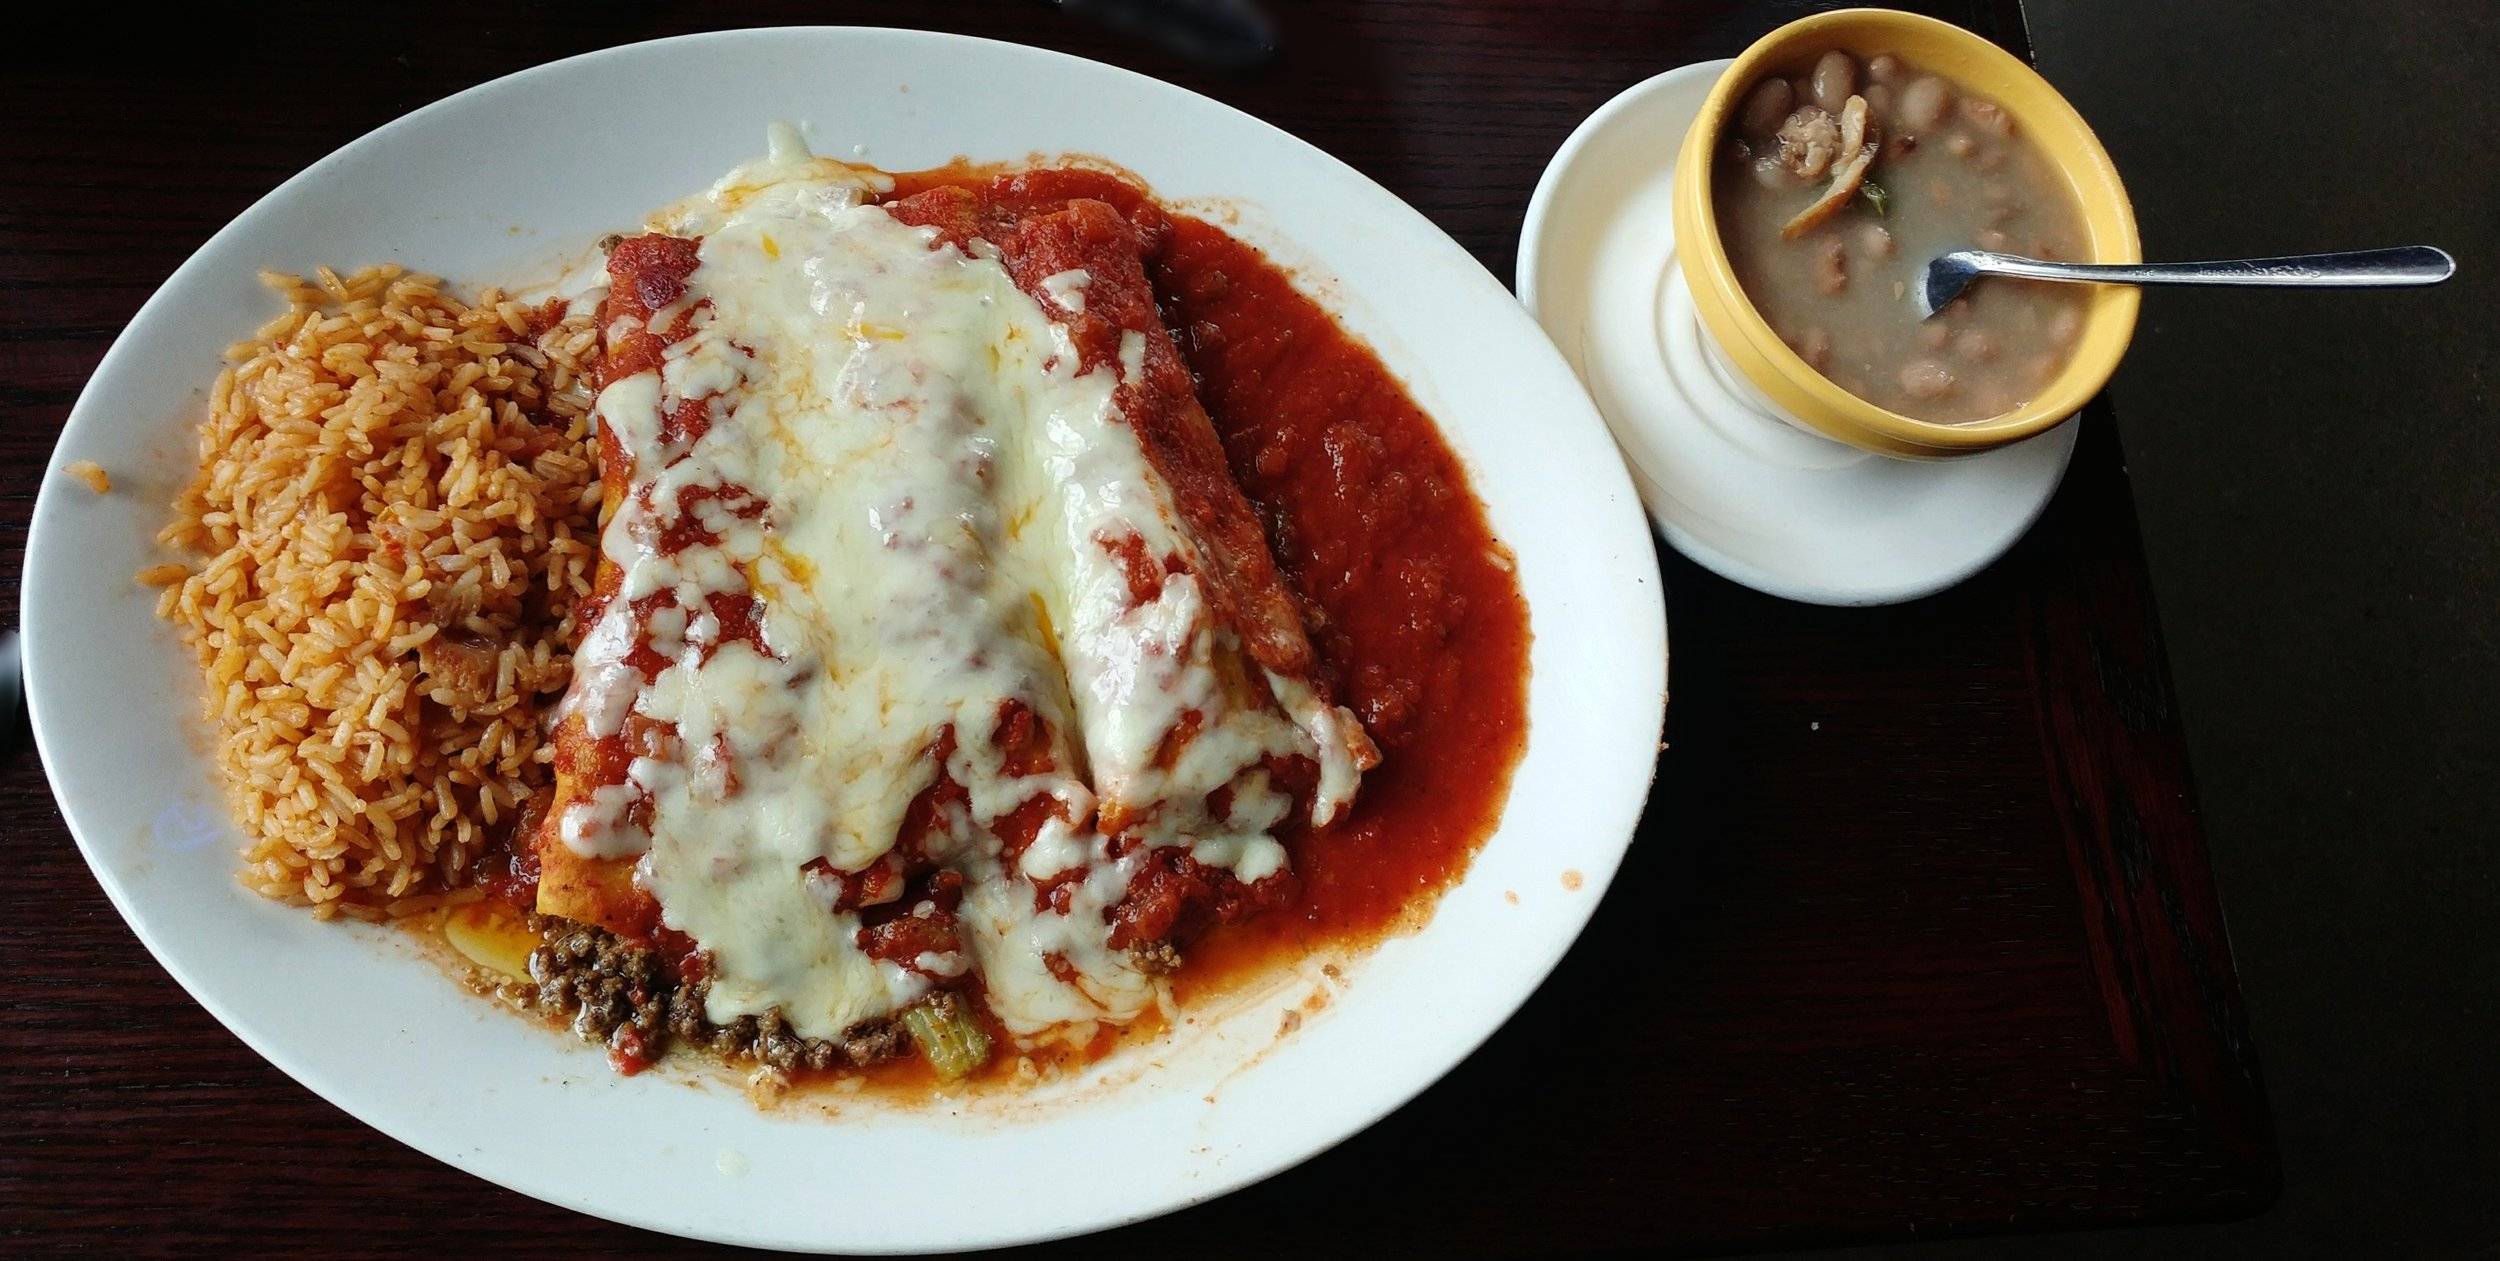 Beef - with Ranchero sauce